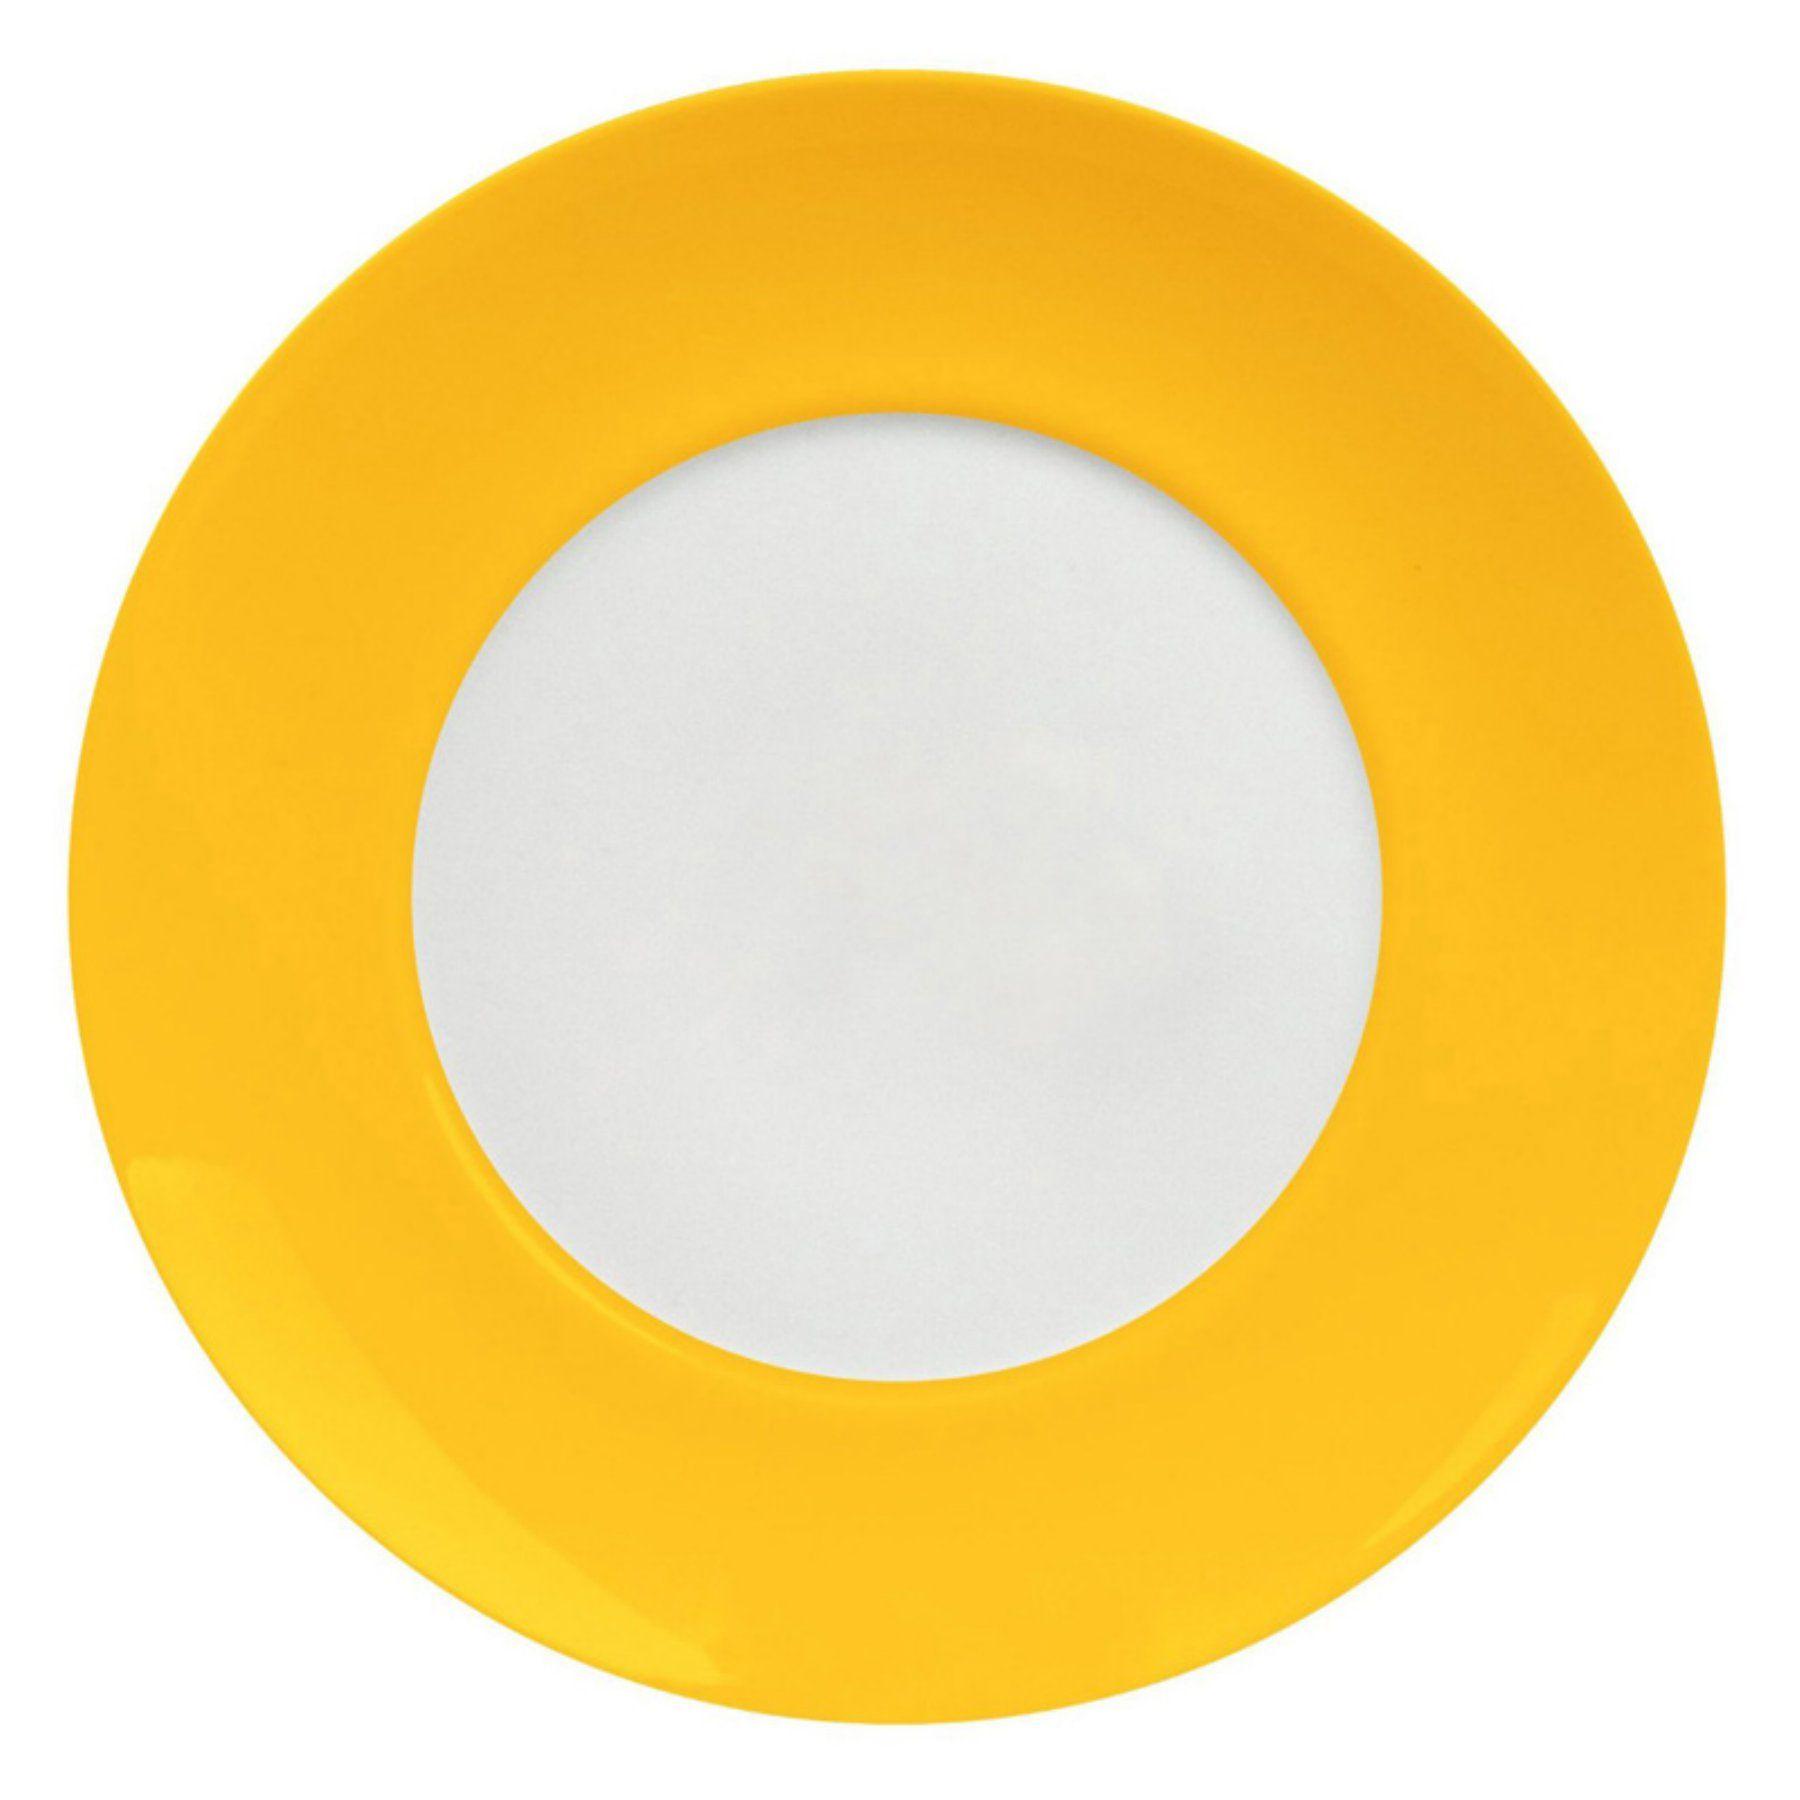 Waechtersbach Uno Salad Plates Curry - Set of 4 - 44S4SL0030